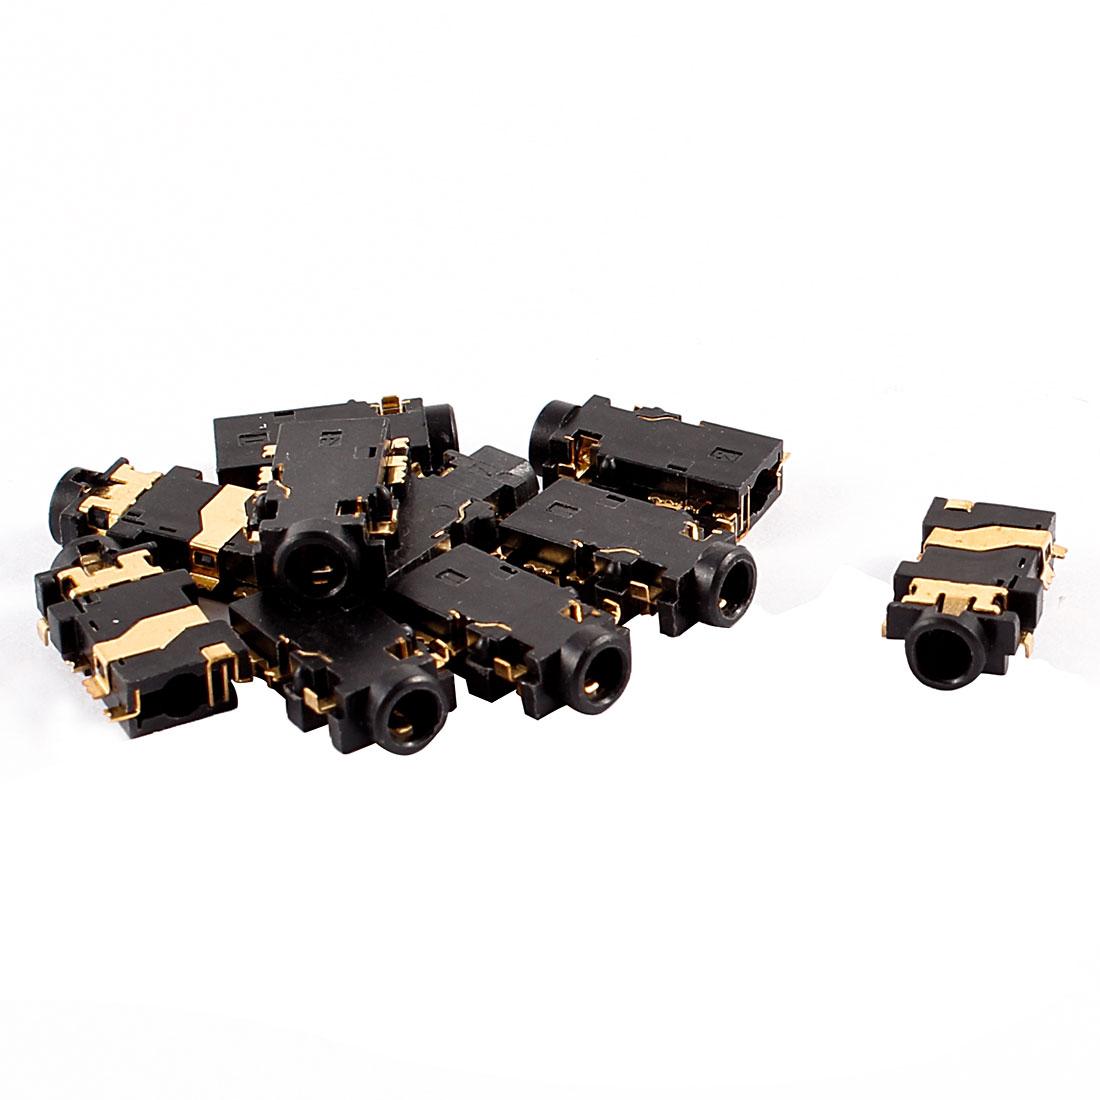 10 Pcs 2.5mm PCB Panel Mount Headphones Stereo Jack Socket